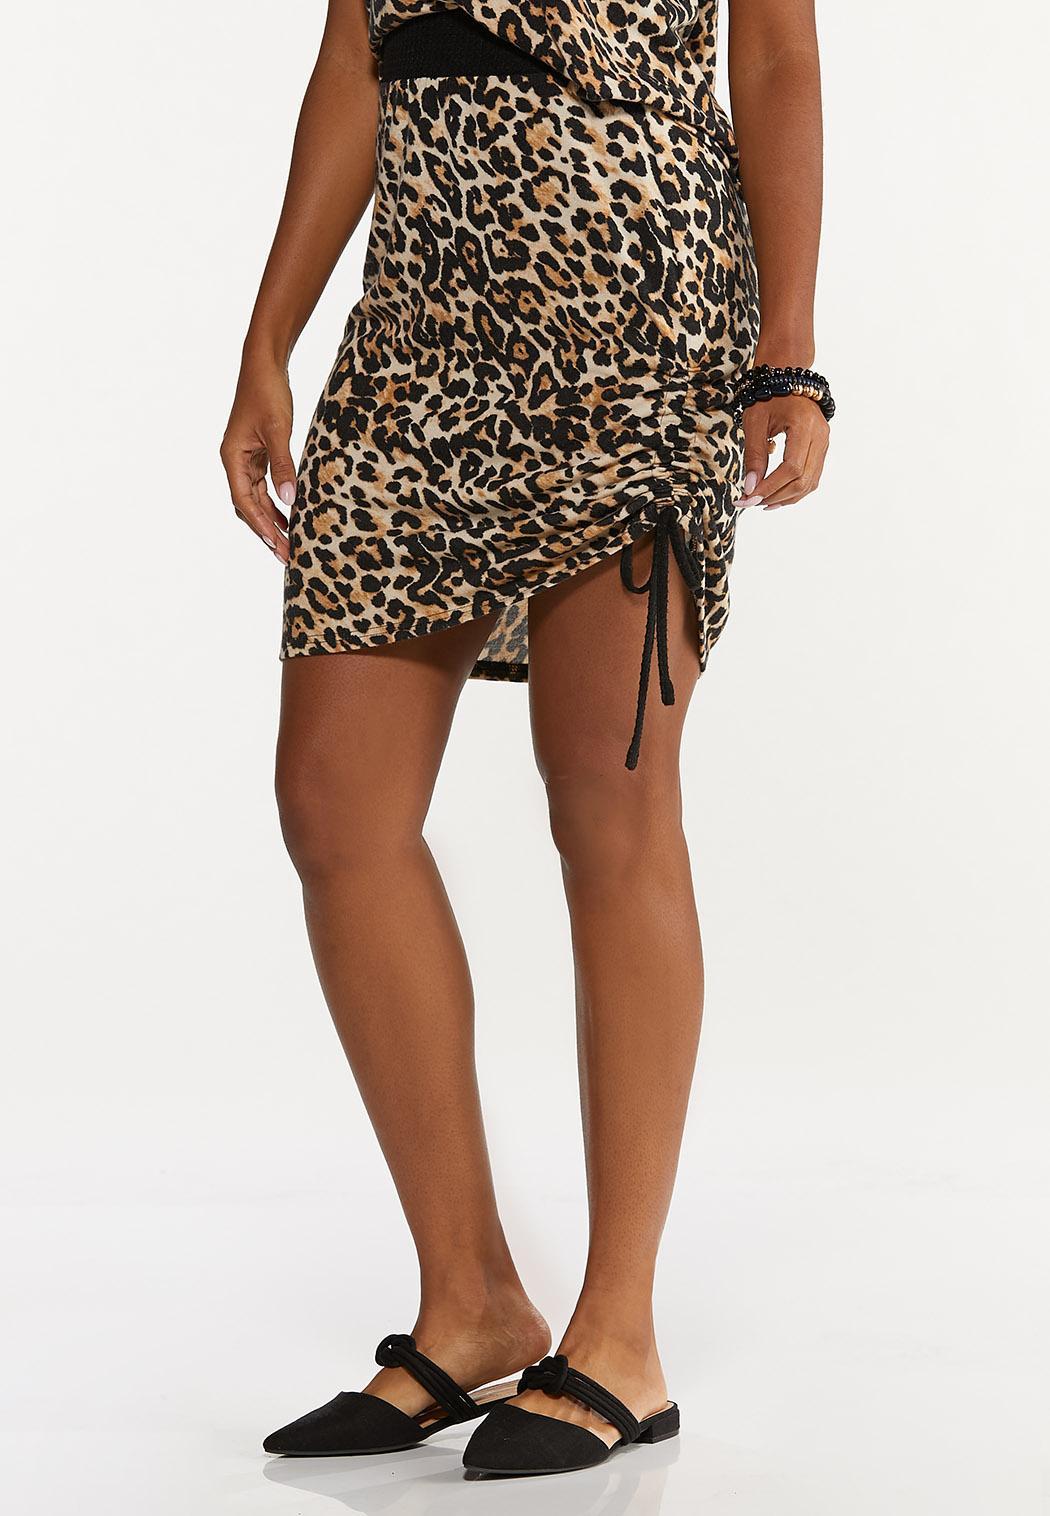 Plus Size Leopard Drawstring Skirt